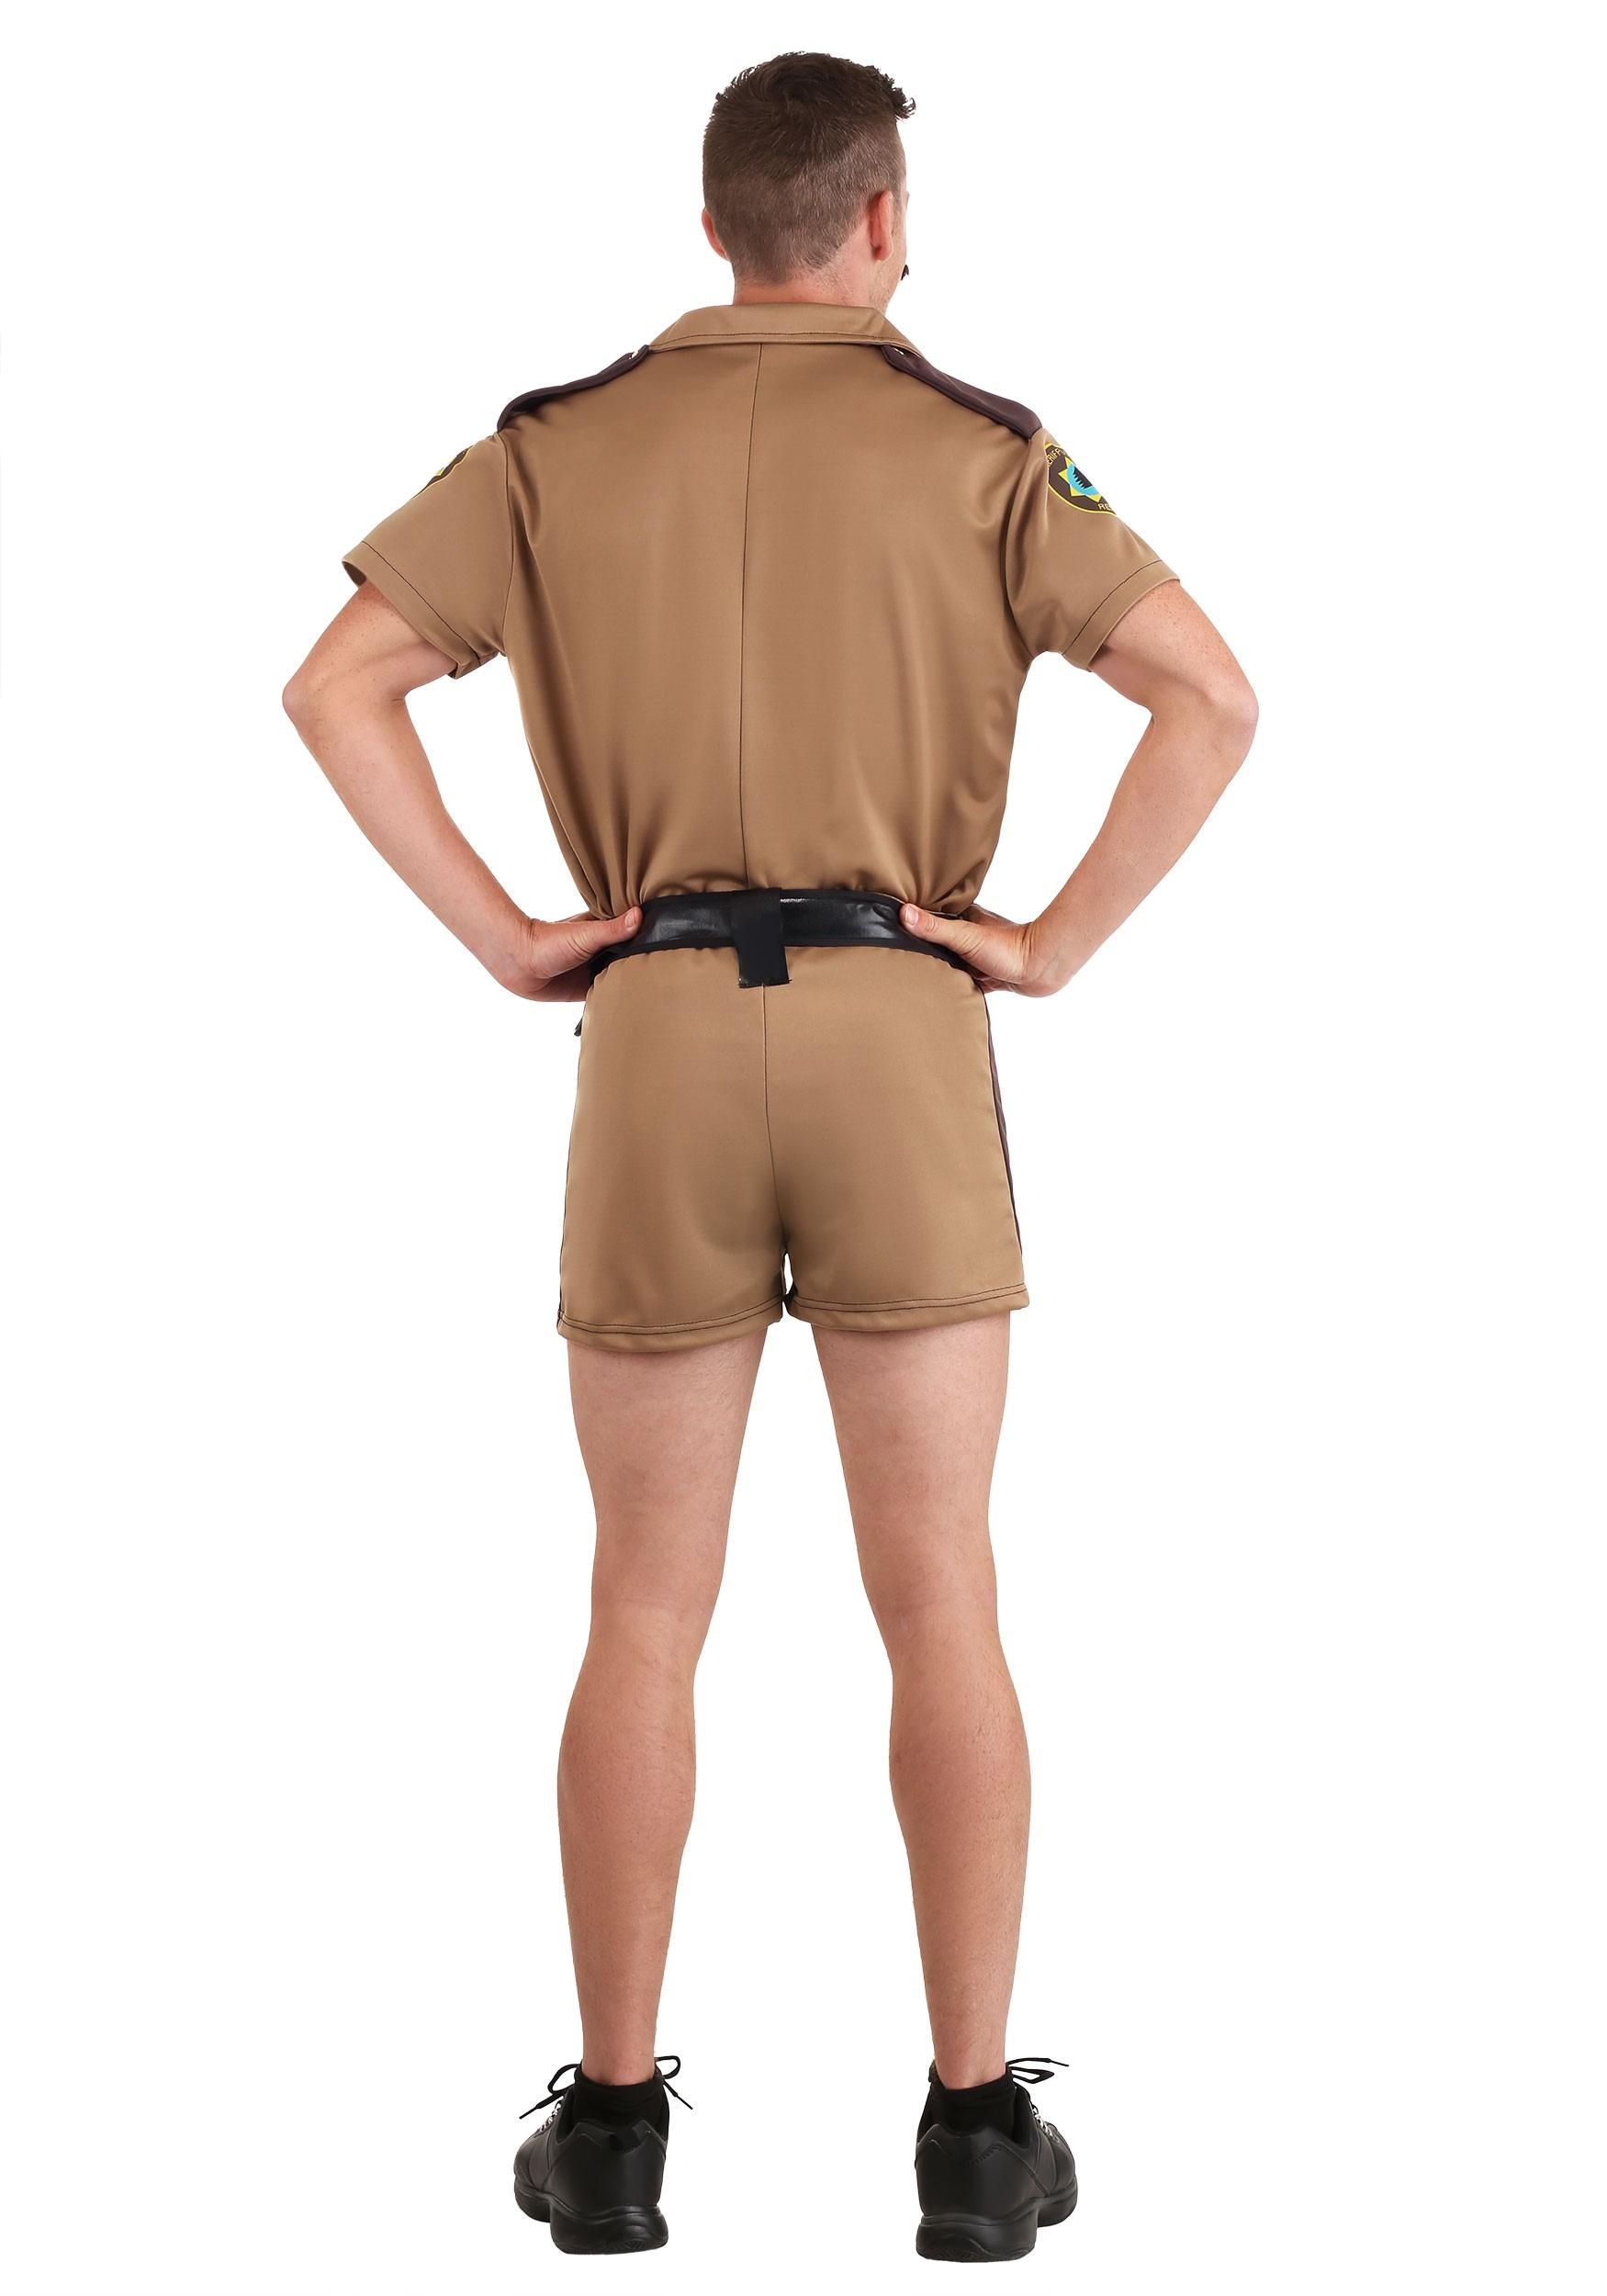 Reno 911 Halloween Costume.Lt Dangle Costume